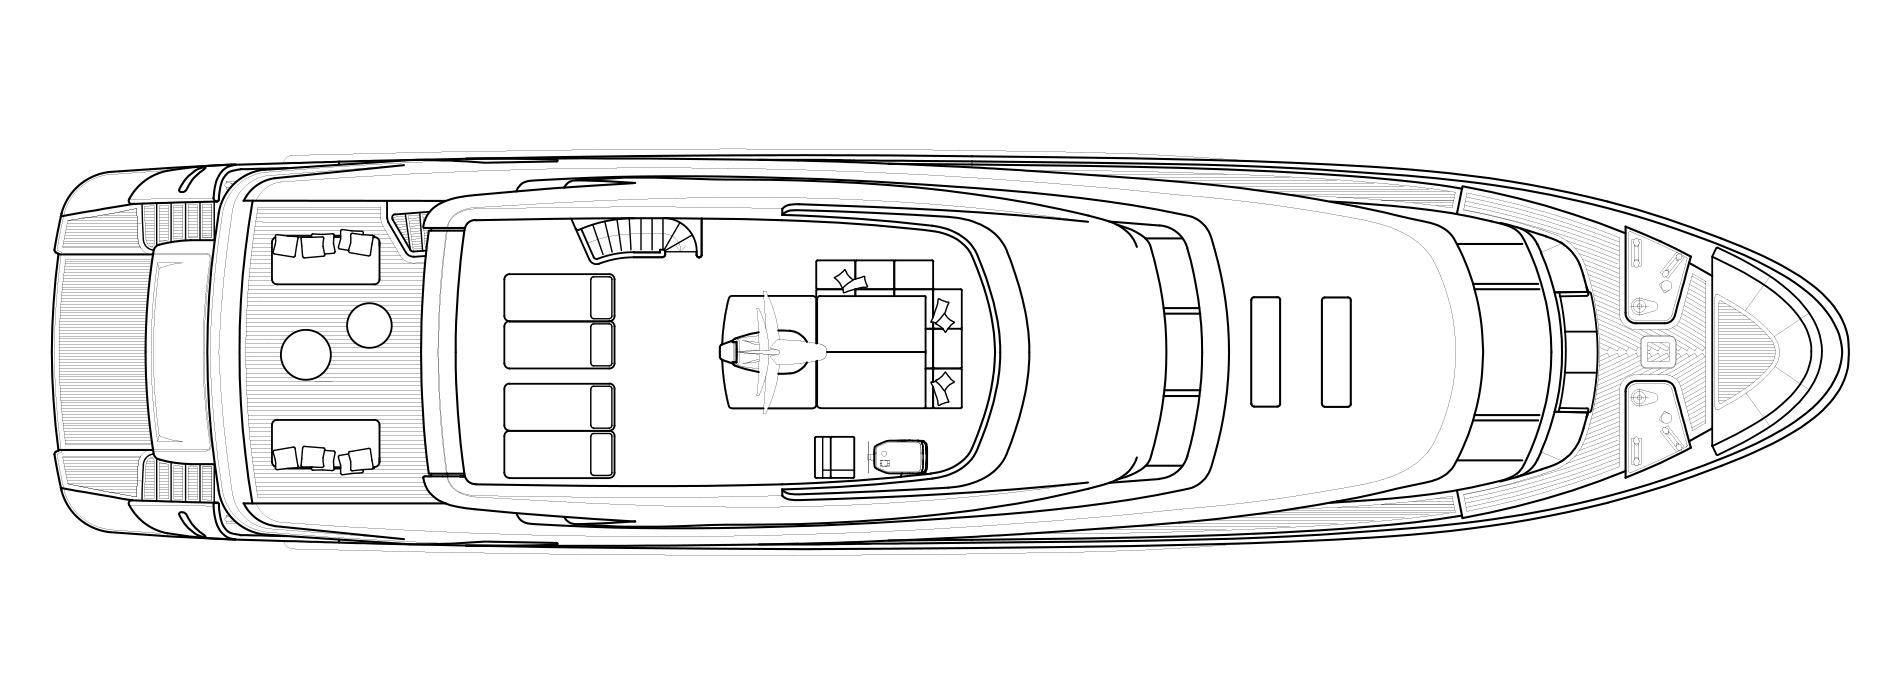 Sanlorenzo Yachts SD112 Флайбридж версия B